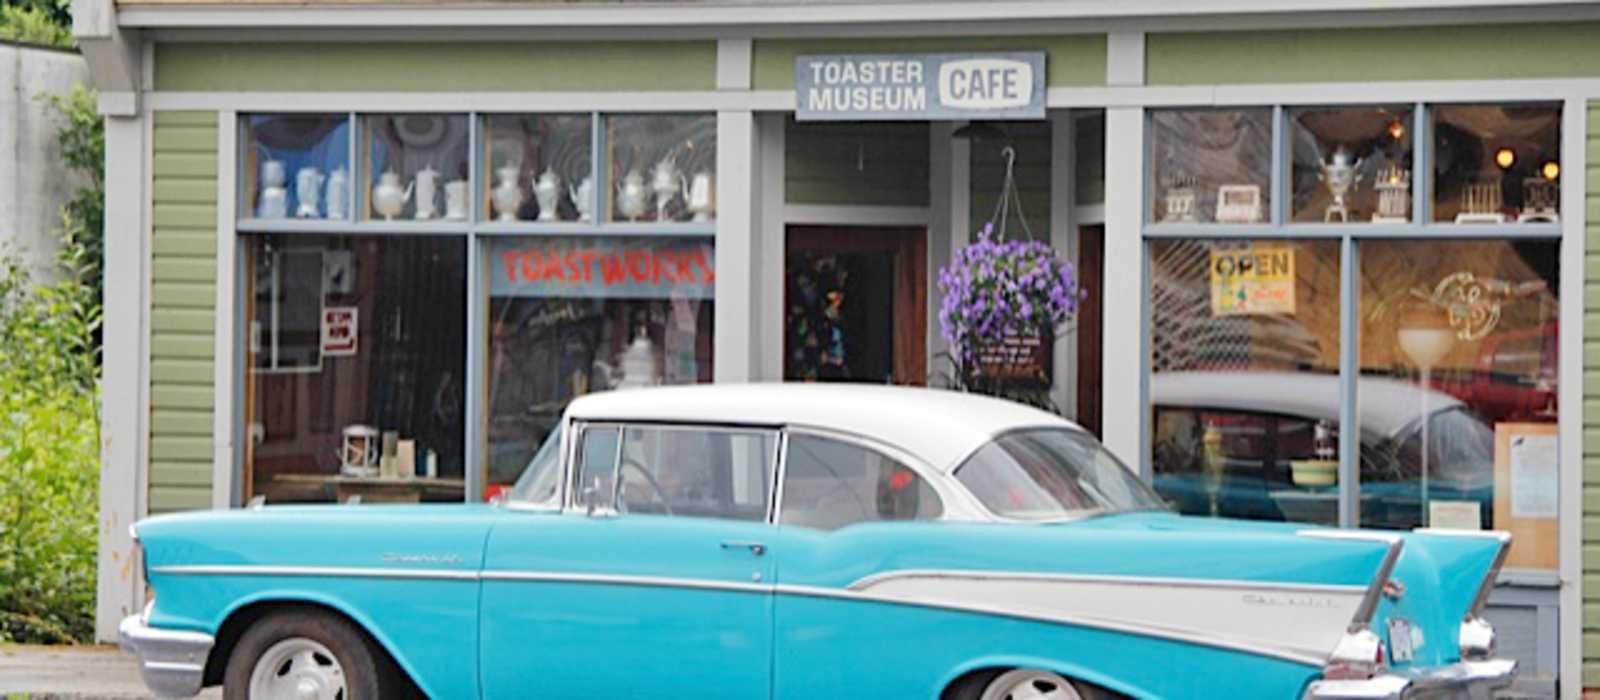 Toaster Cafe/Restaurant